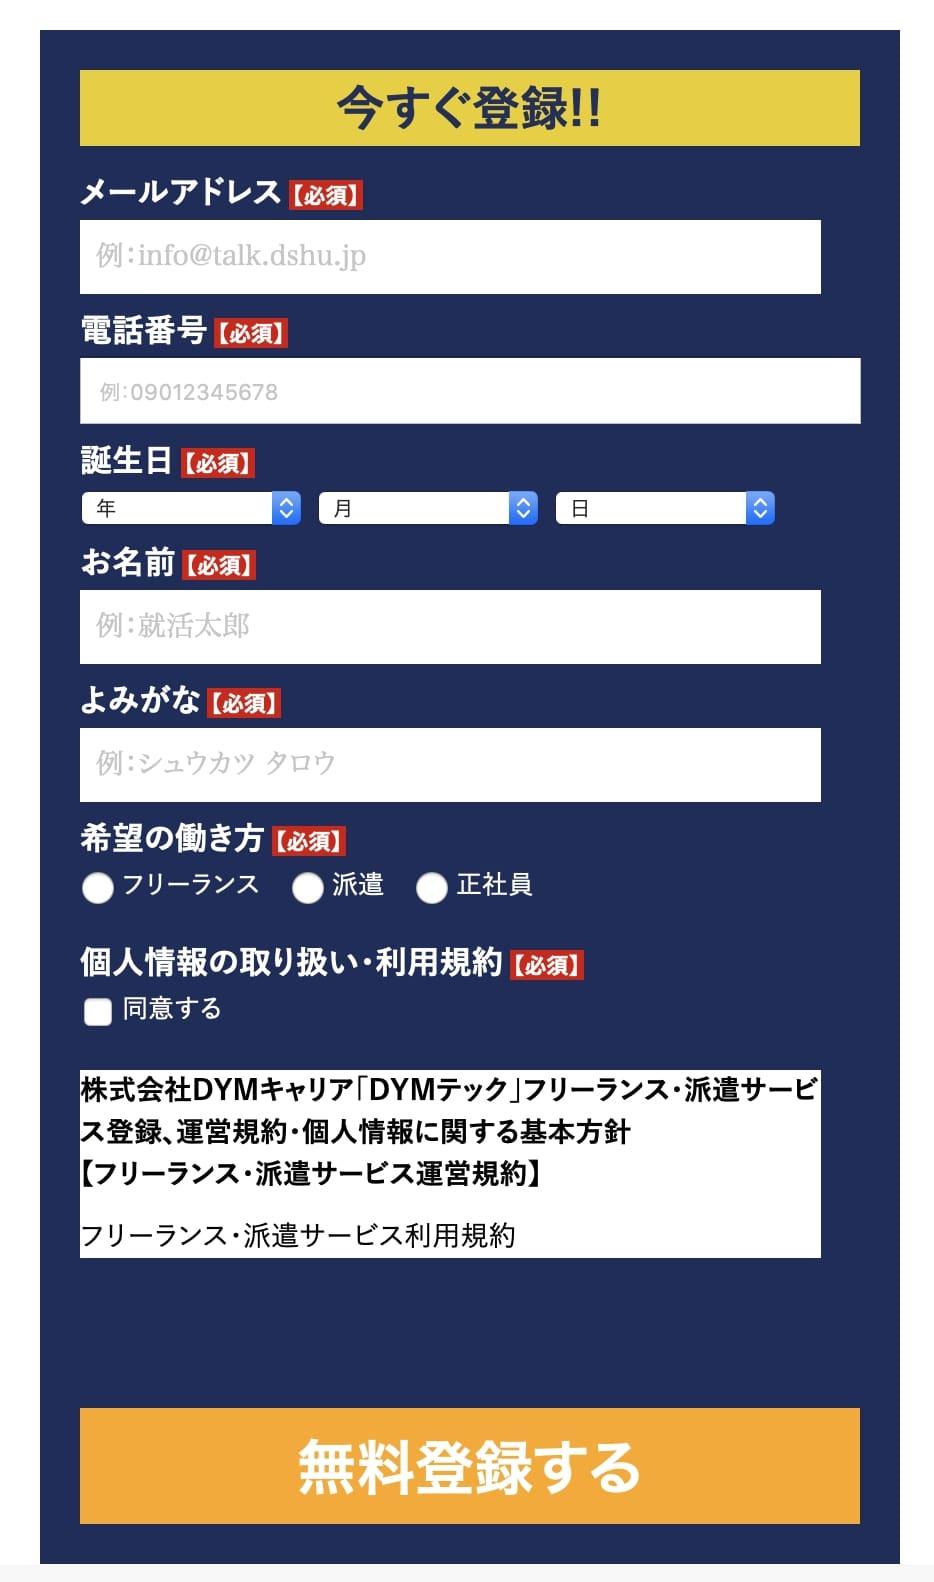 DYMテックの登録フォーム